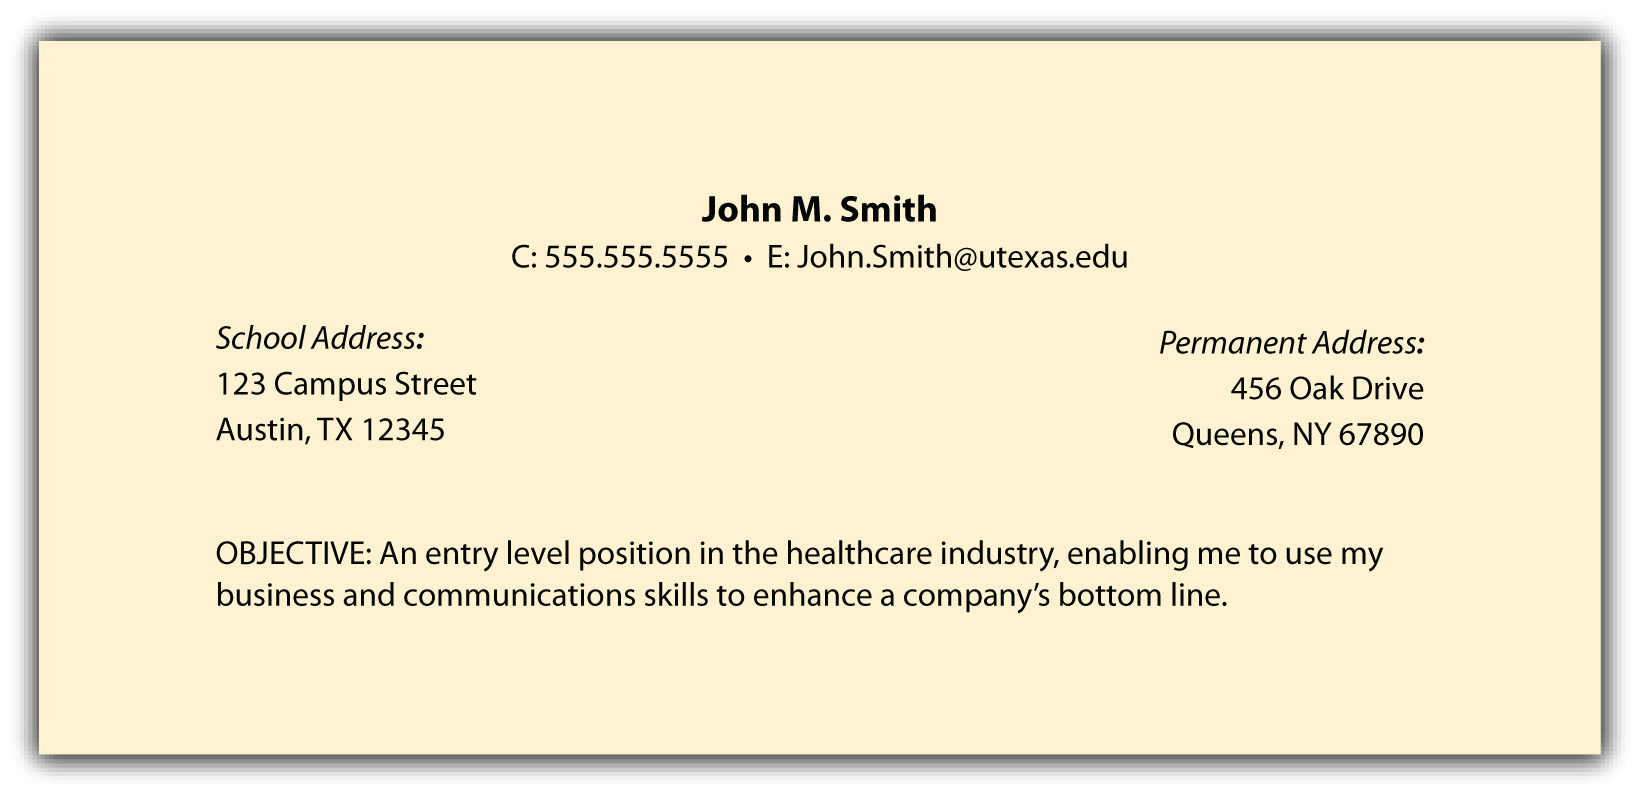 Six Steps To Job Search Success 1 0 Flat World Education